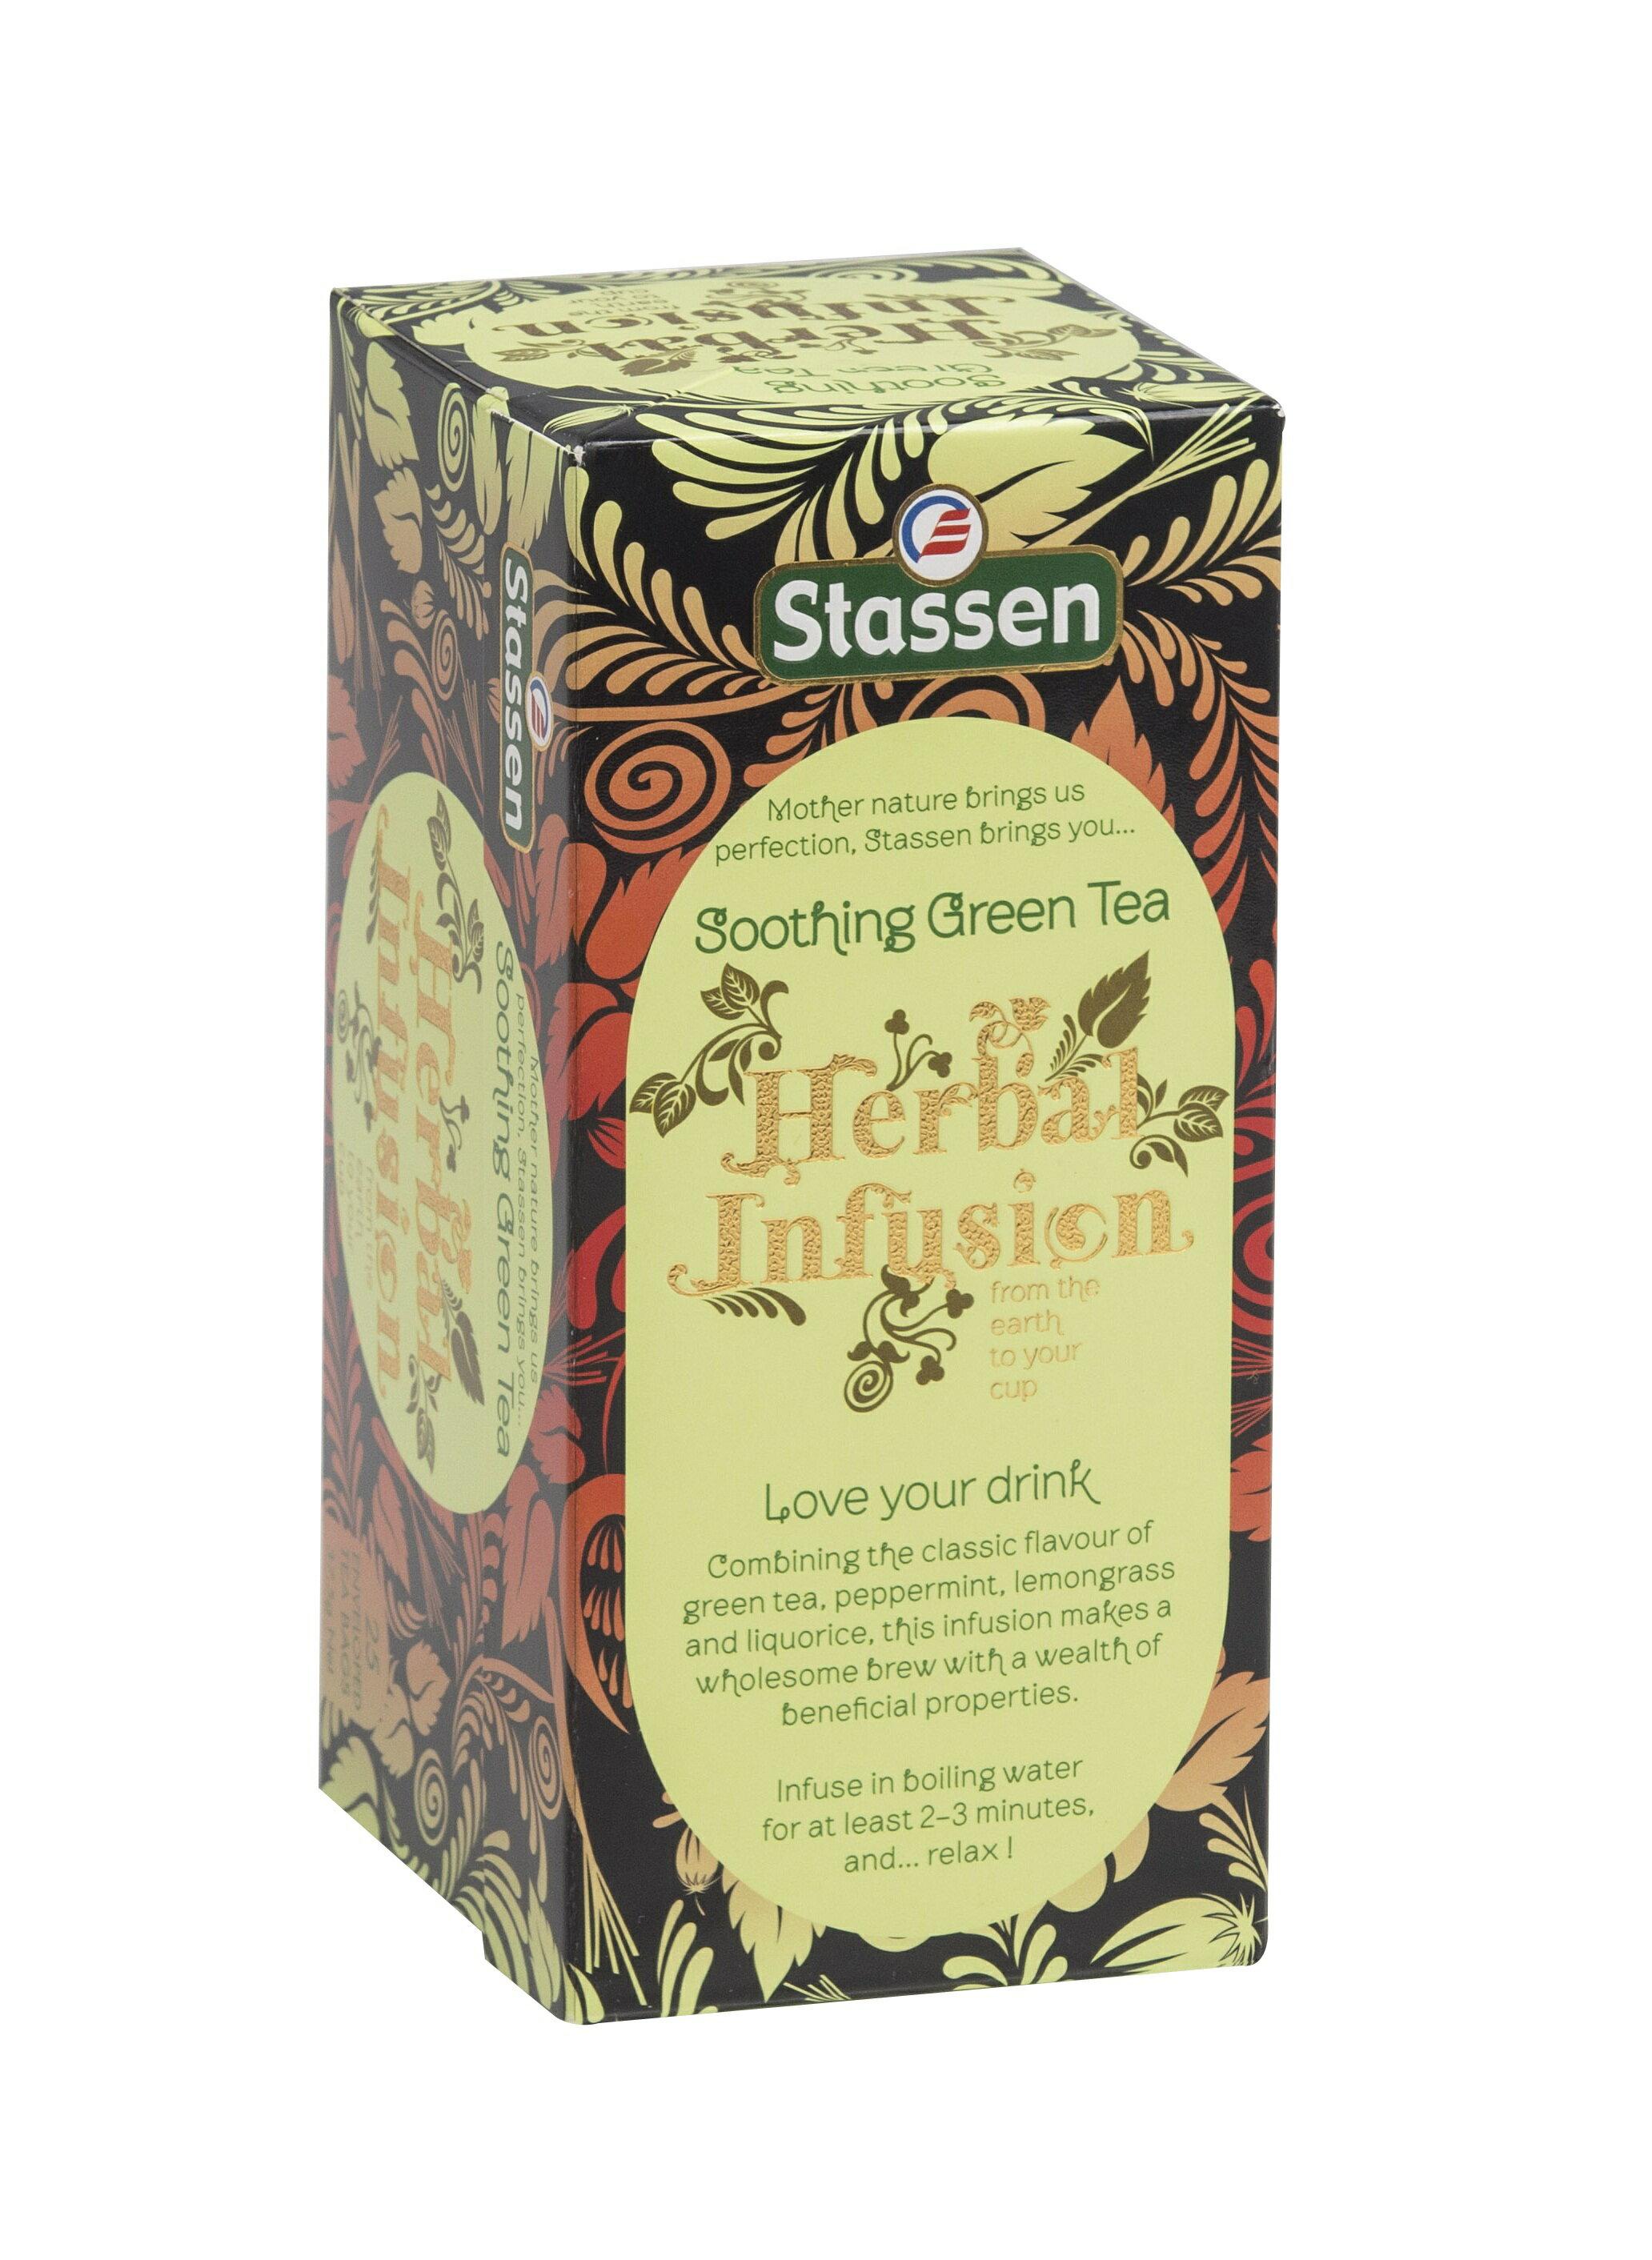 Stassen 司迪生★薄荷綠茶★【25入*1盒】★買一送一★ 0